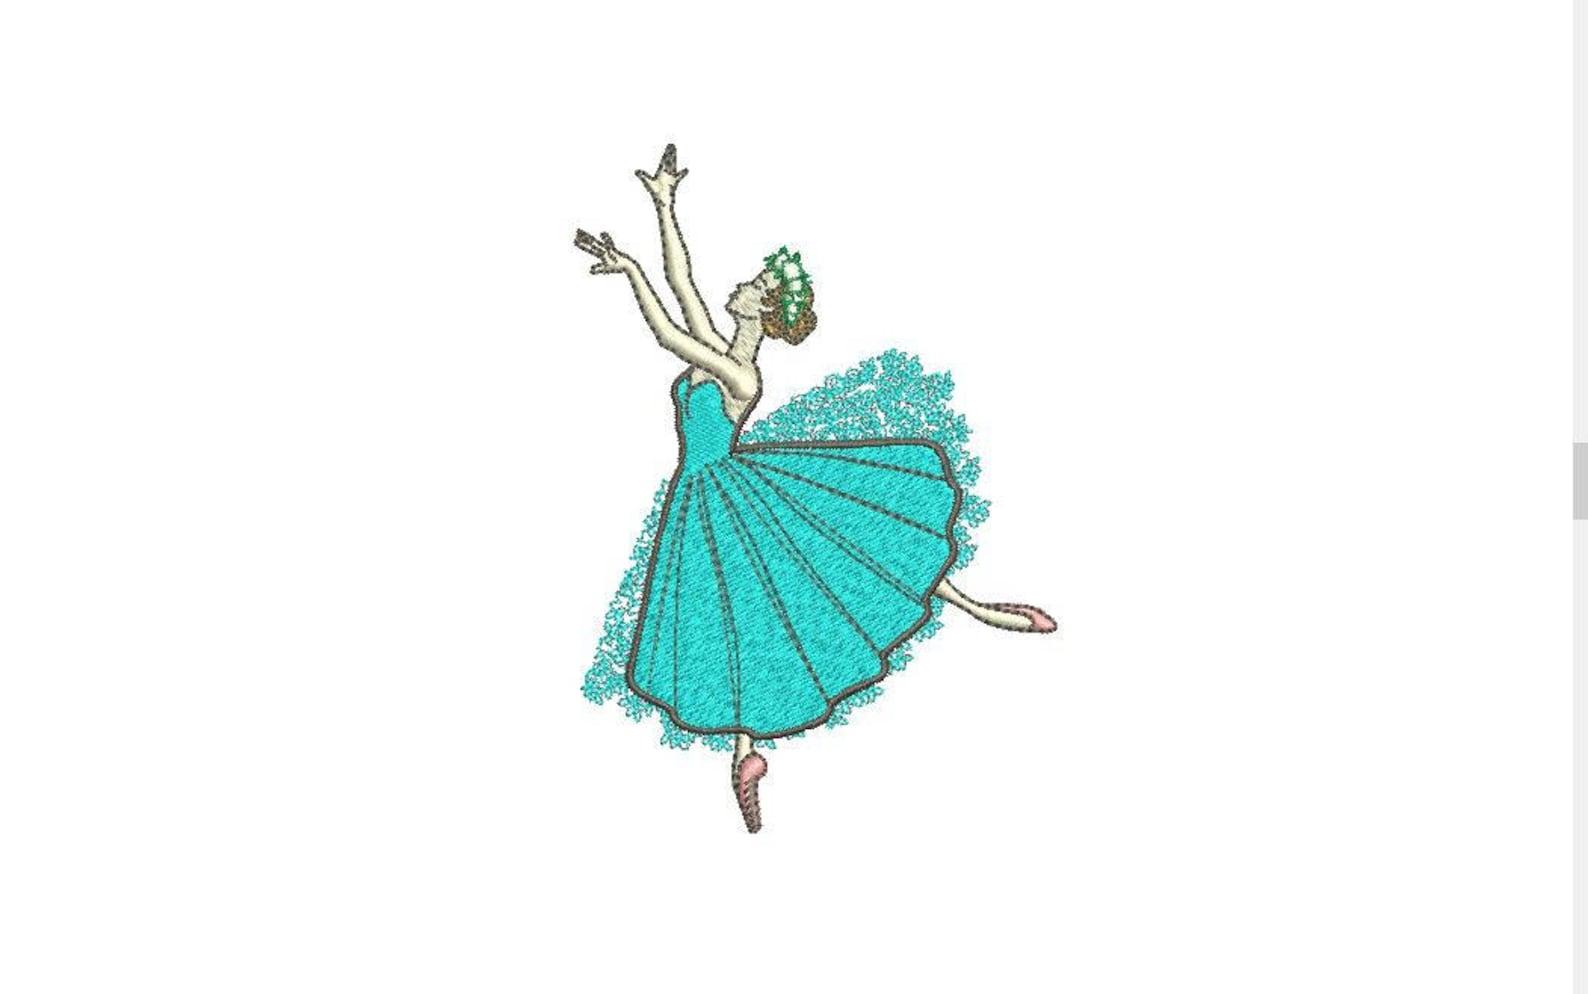 ballerina ballet dancer machine embroidery file design 4x4 hoop